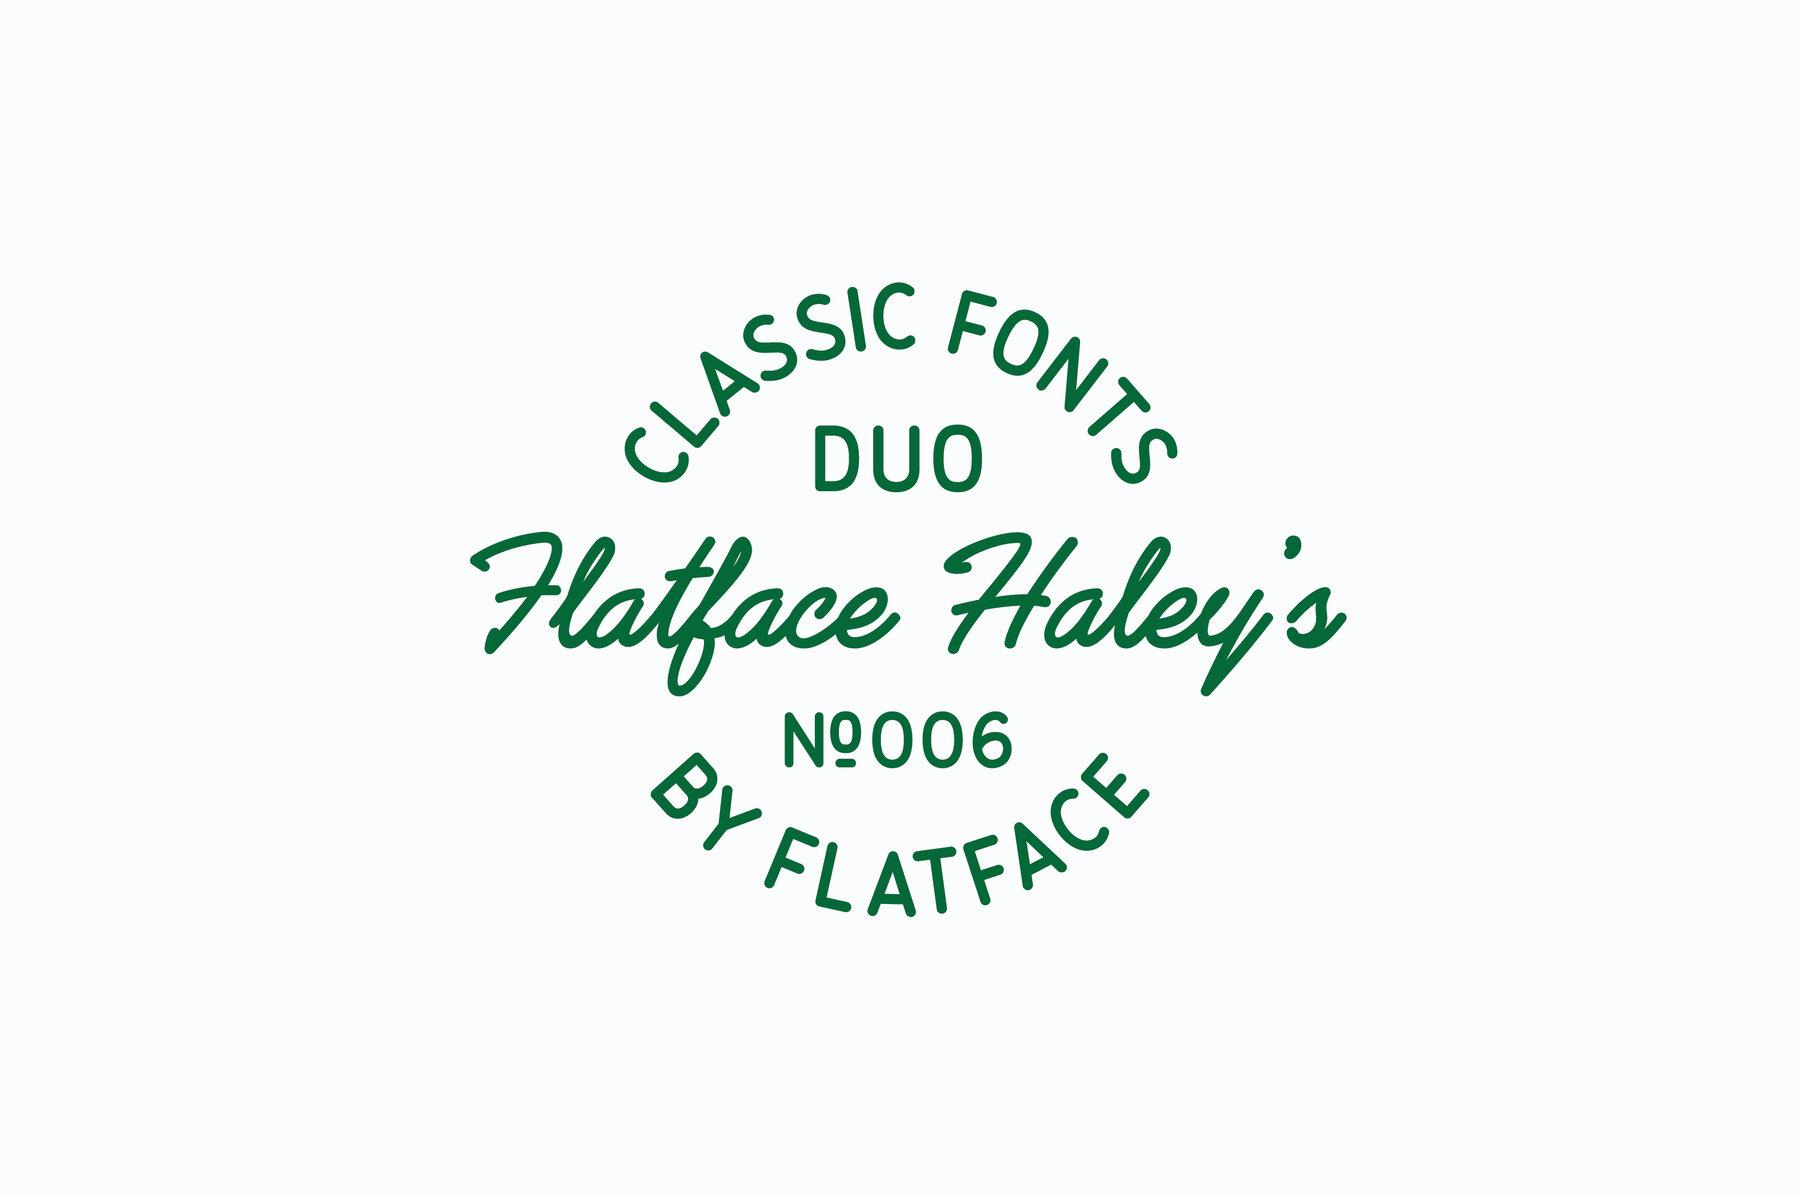 Flatface Haleys